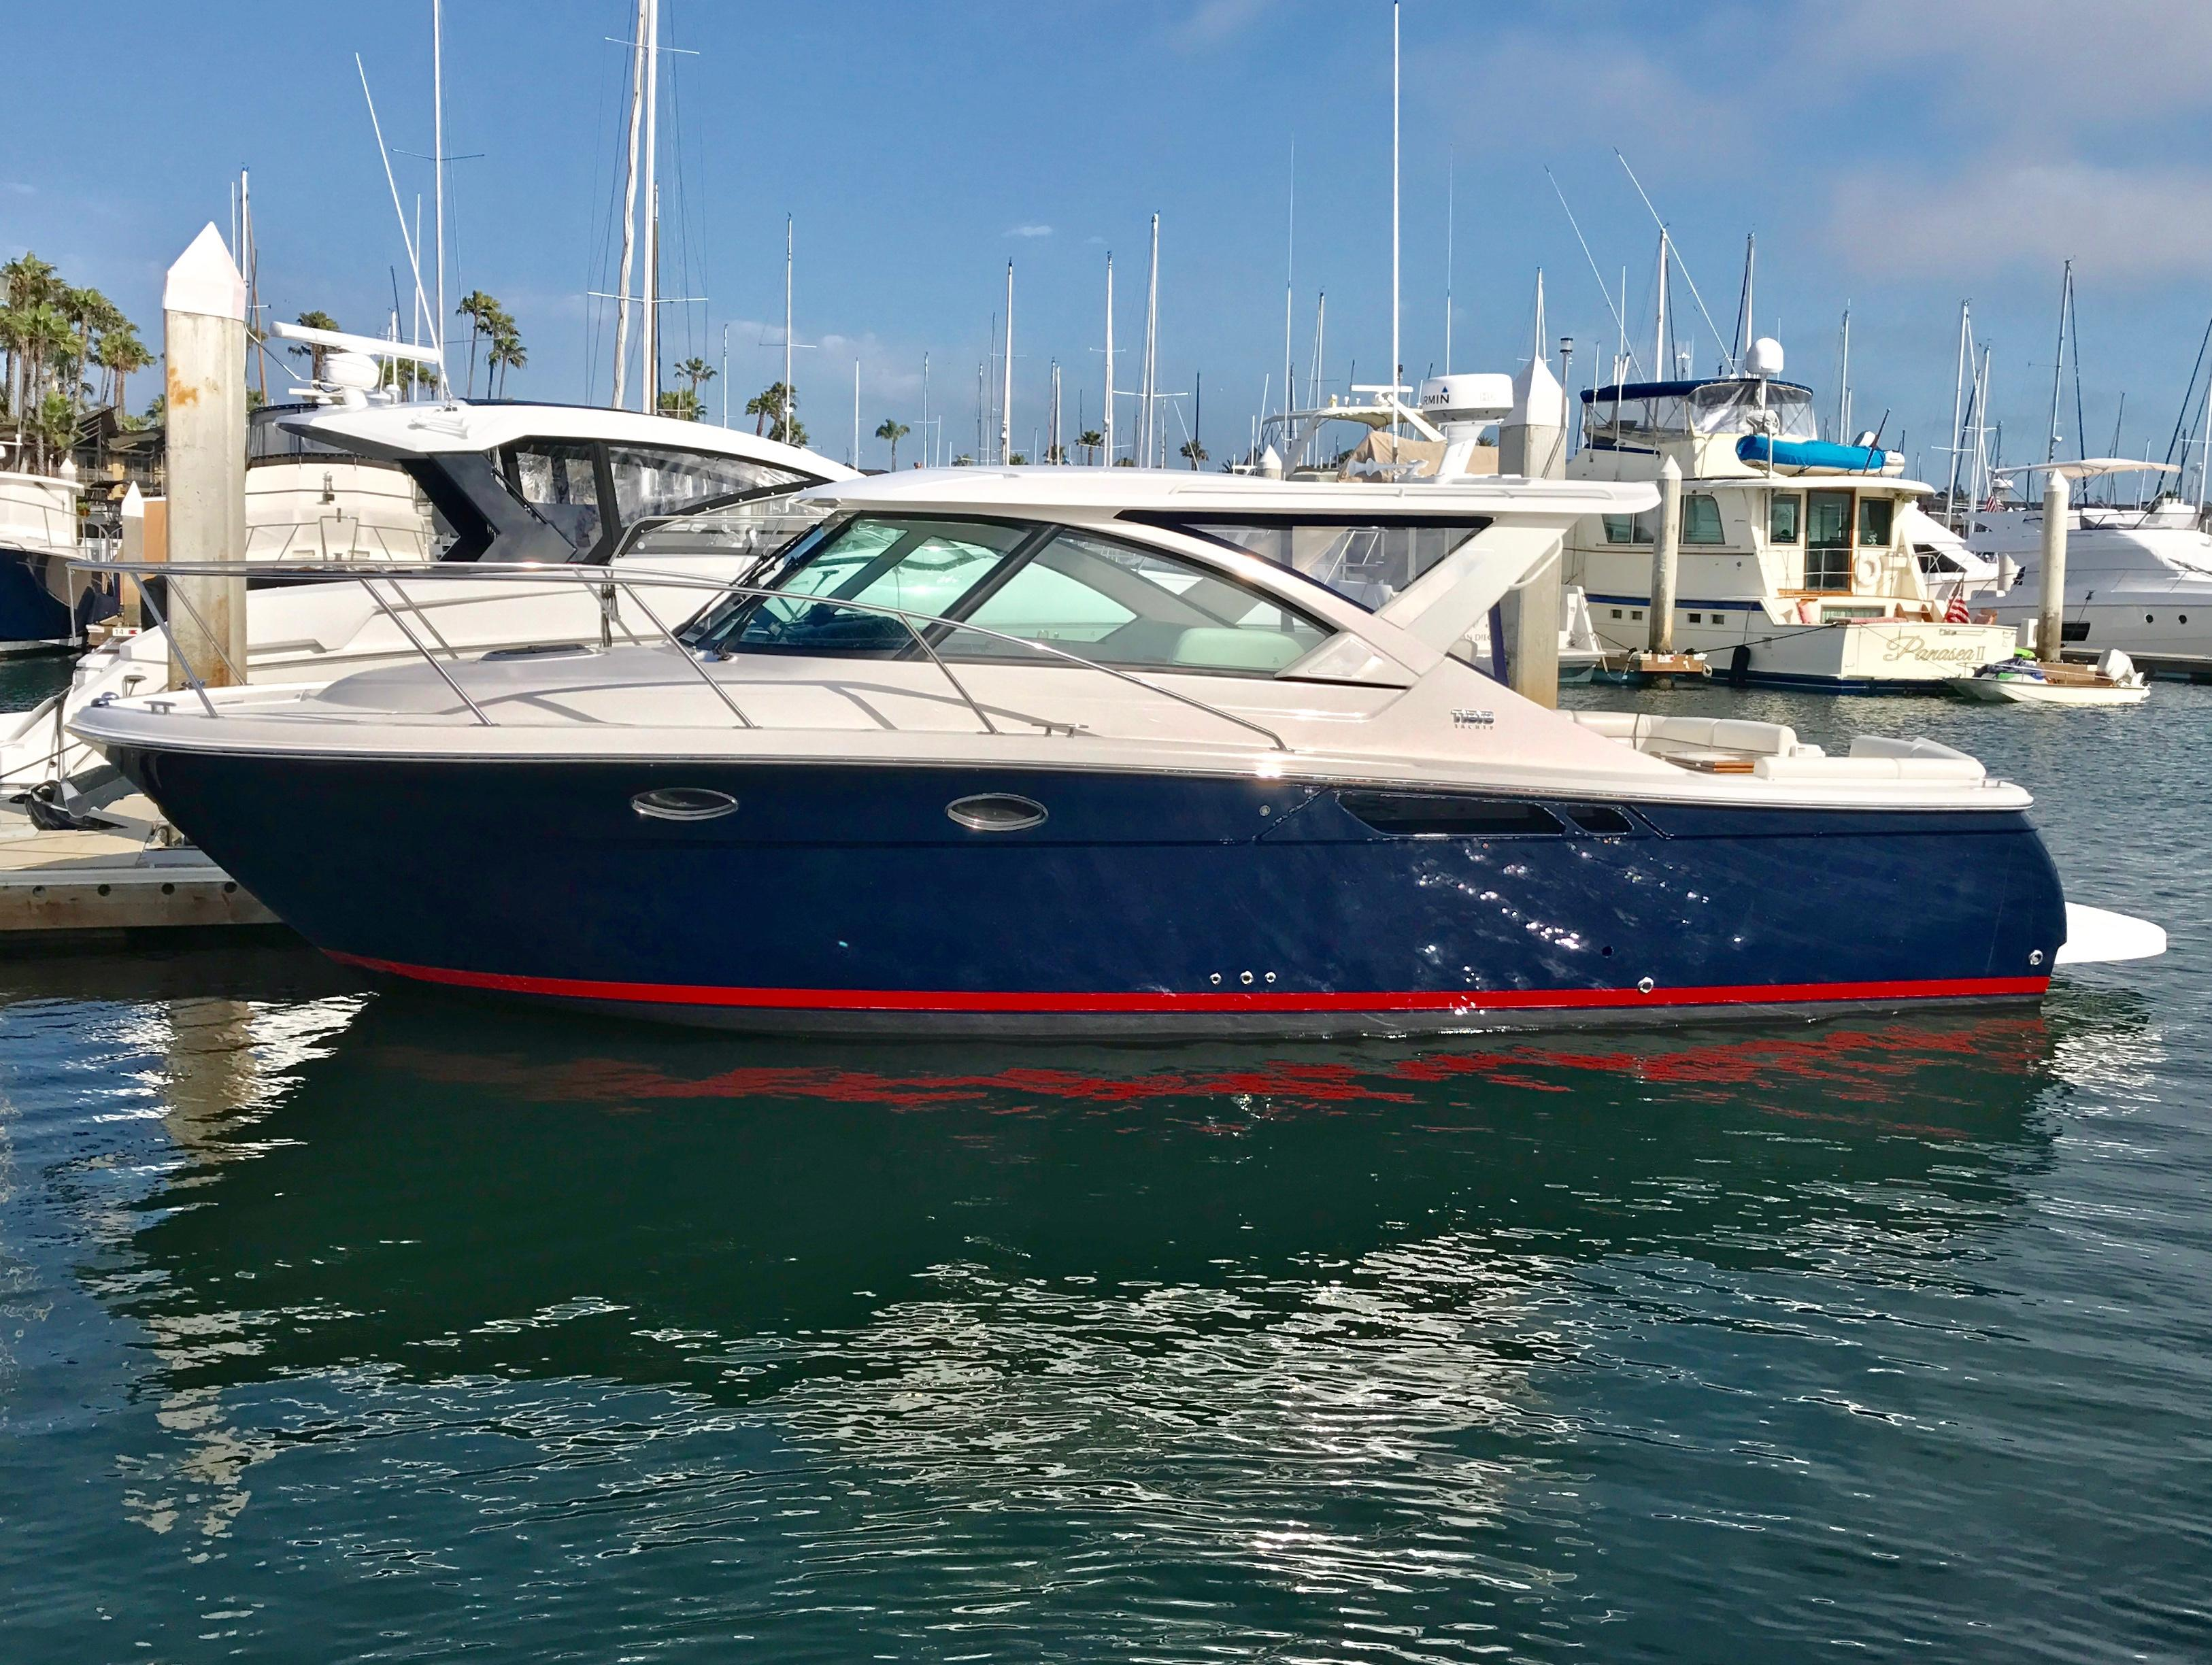 Luna Sea Tiara 2018 3100 Coronet 31 Yacht For Sale In Us